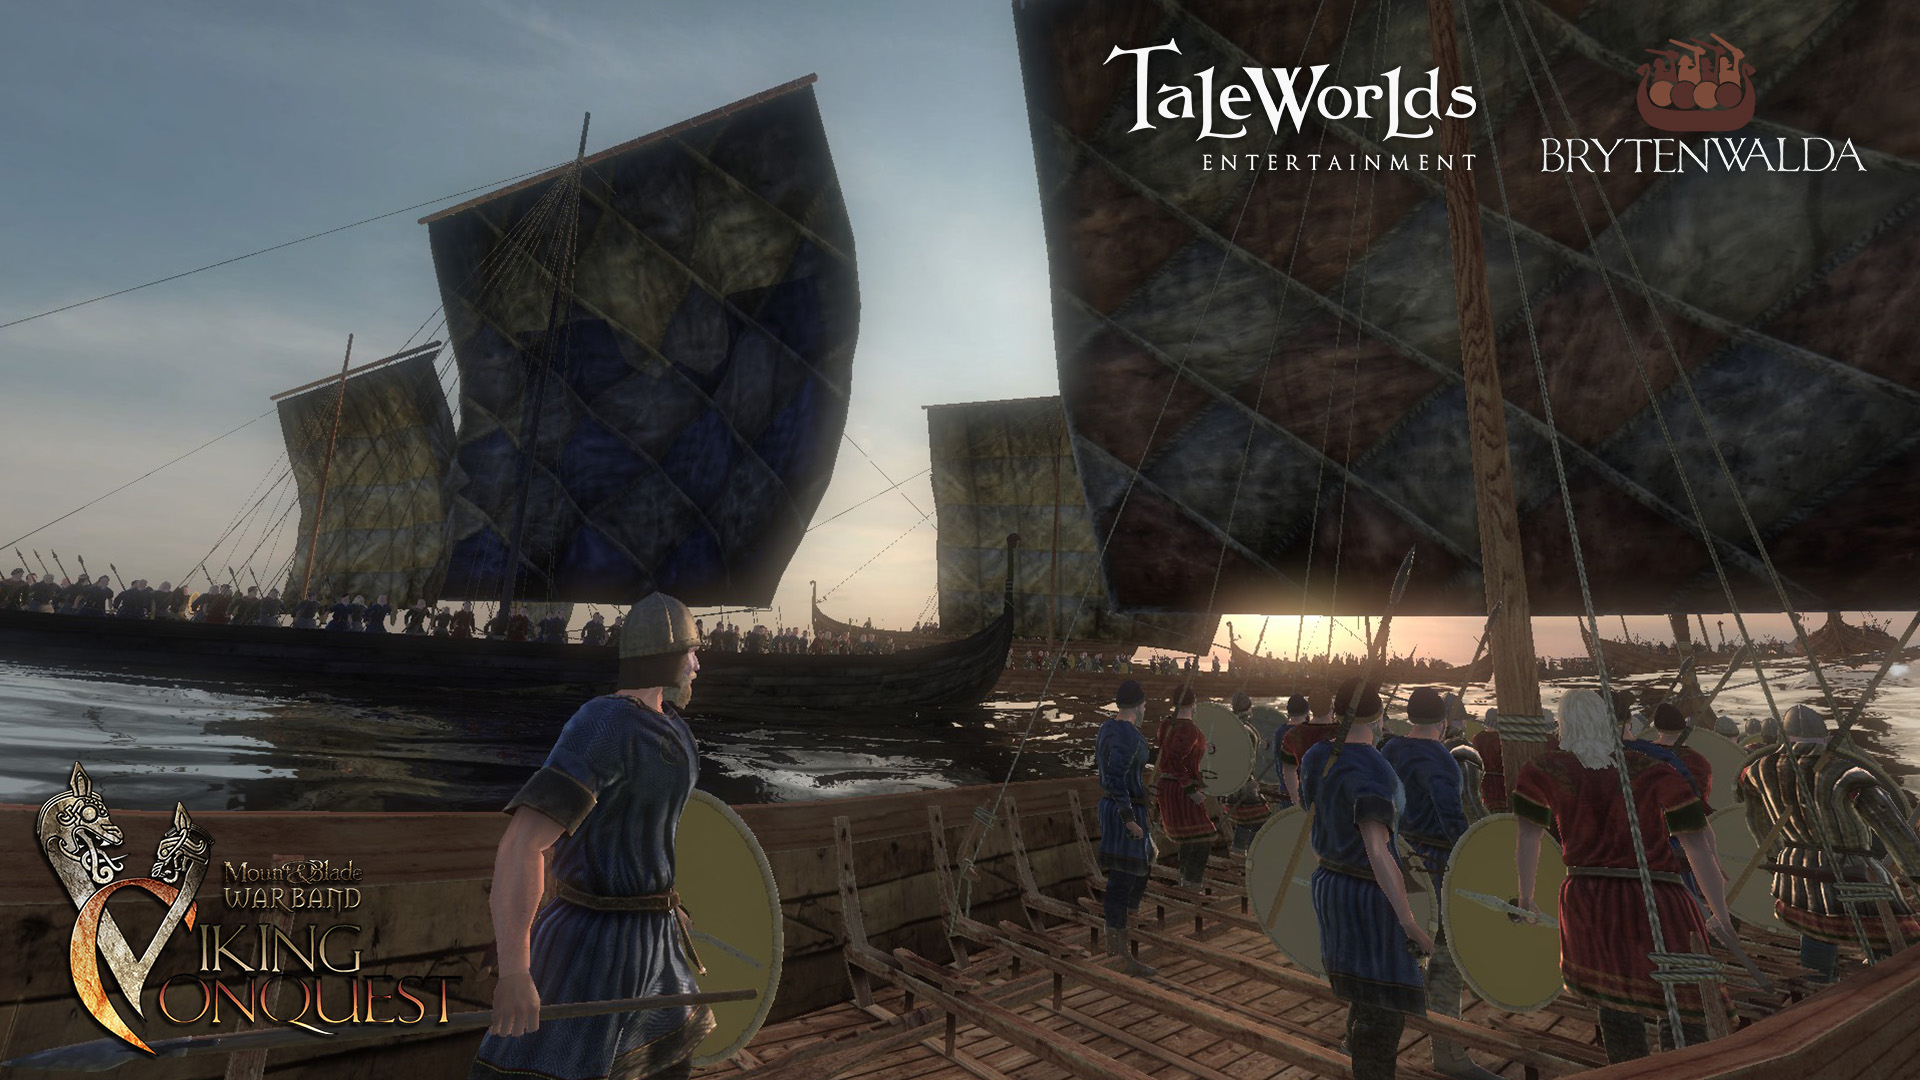 Viking Conquest: discusión general - Página 5 A15ae7b4904af92eef2d24c904faf425735255c9